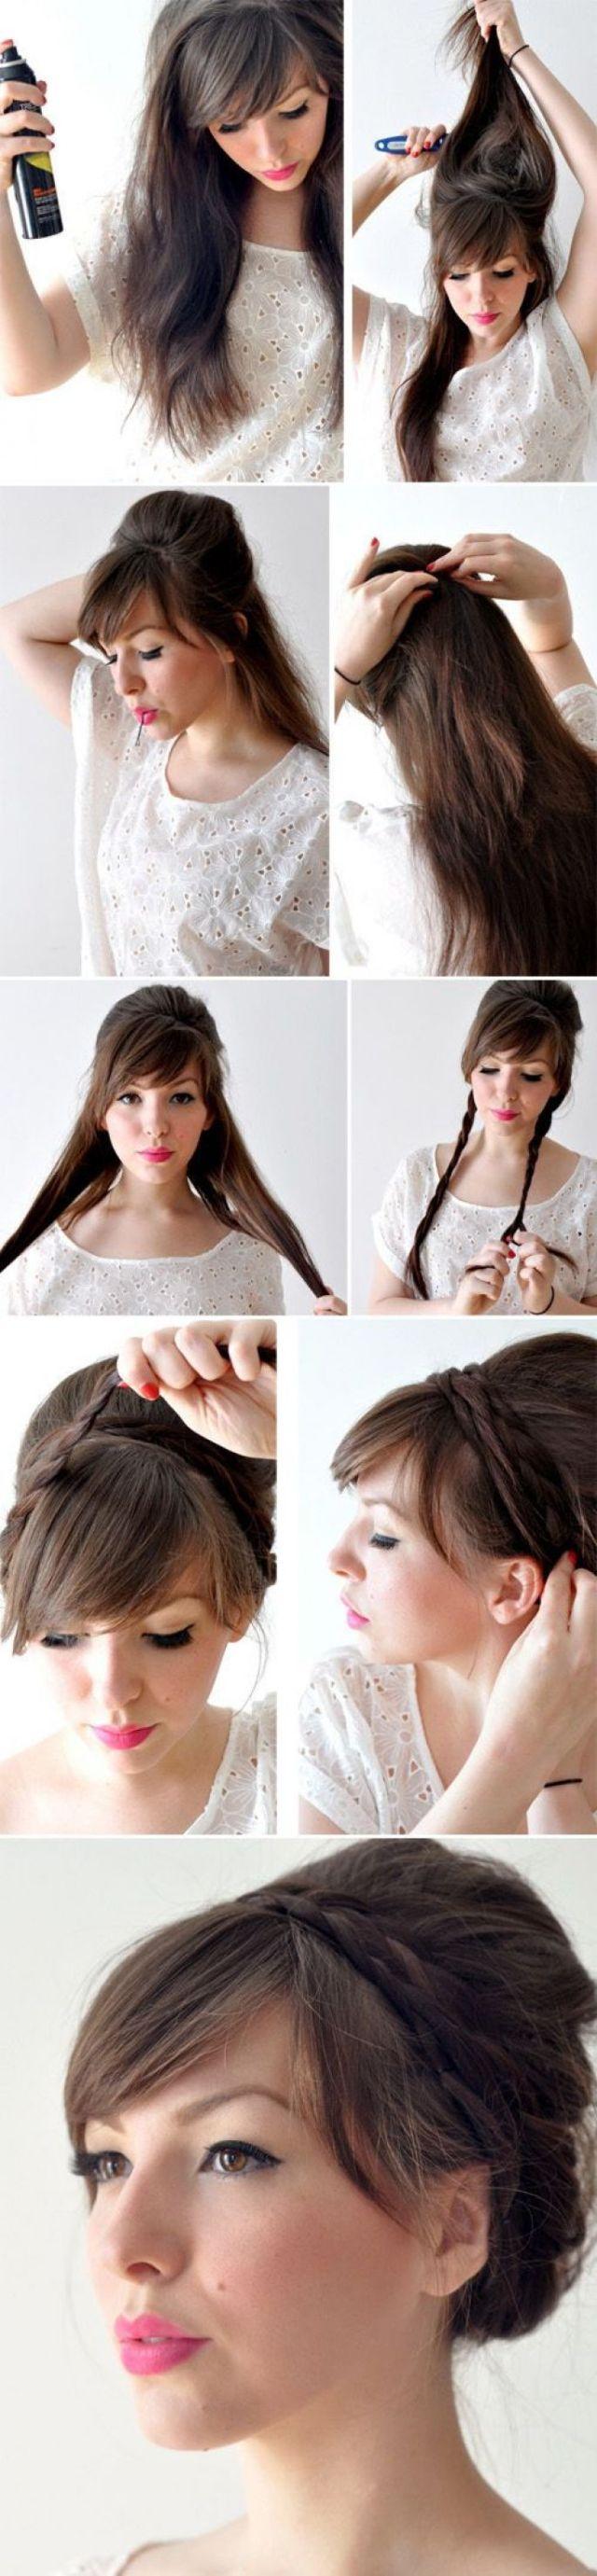 Best 20 Side fringe hairstyles  ideas on Pinterest